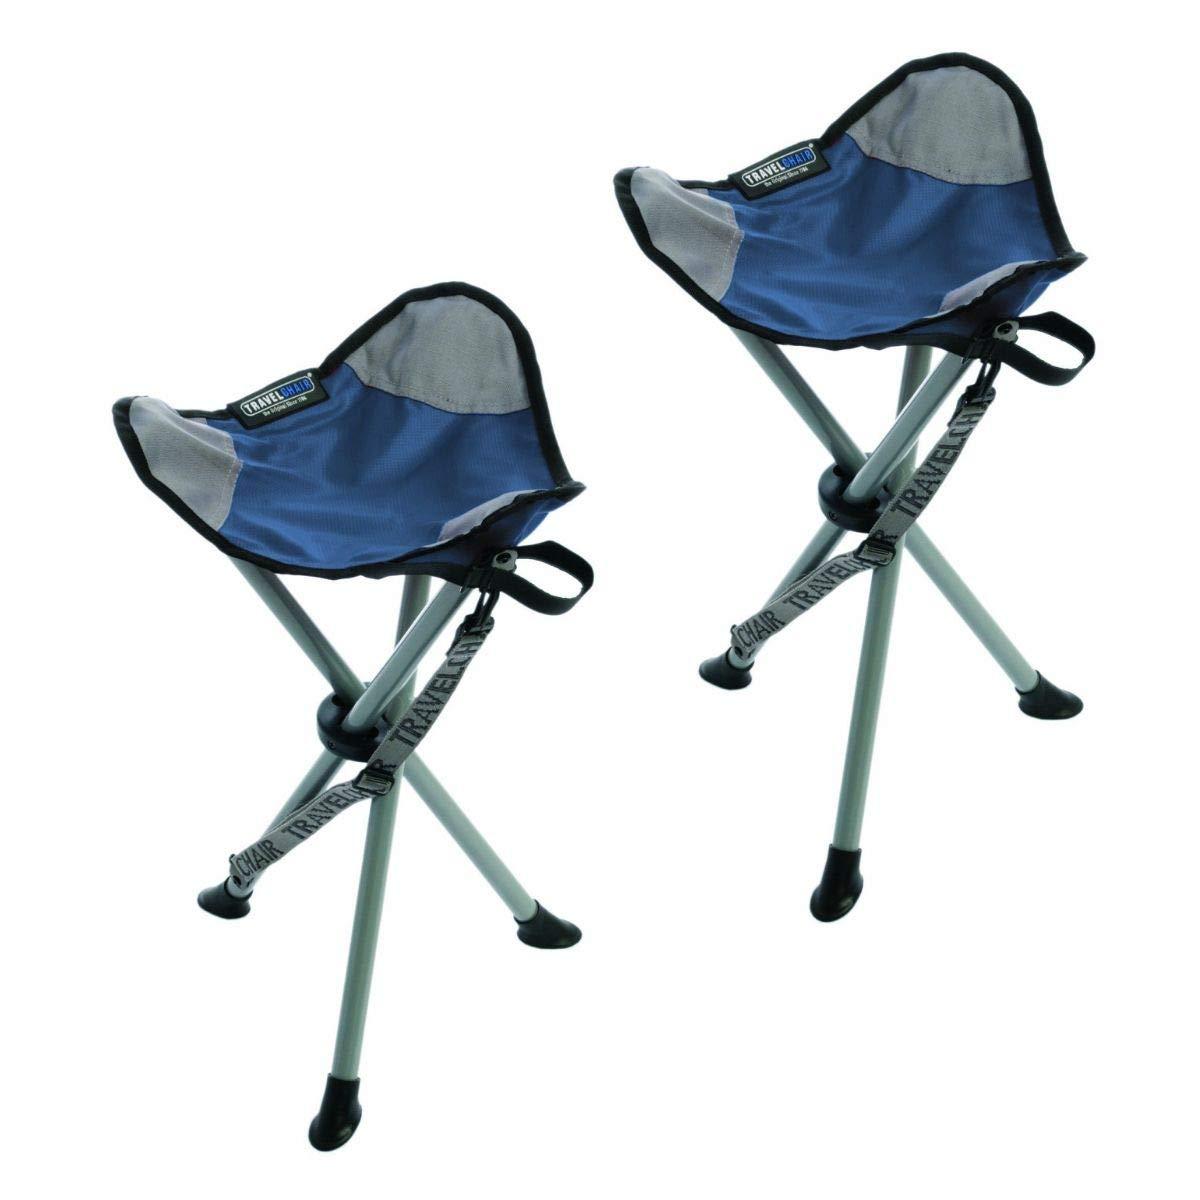 TravelChair Slacker Chair, Super Compact, Folding Tripod Camping Stool (Blue/Set of 2)